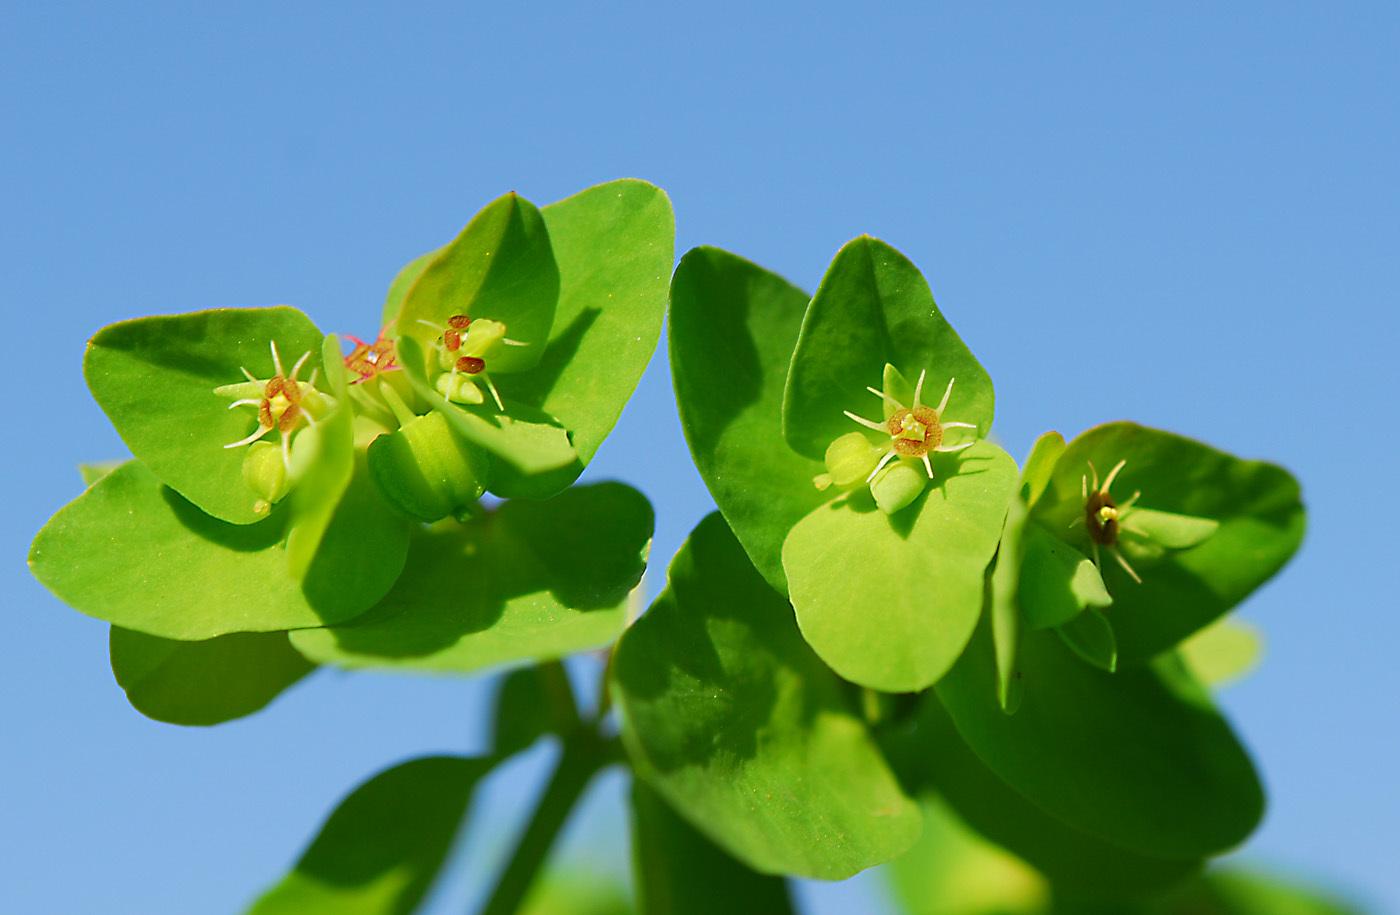 https://pictures.bgbm.org/digilib/Scaler?fn=Cyprus/Euphorbia_peplus_B1.jpg&mo=file